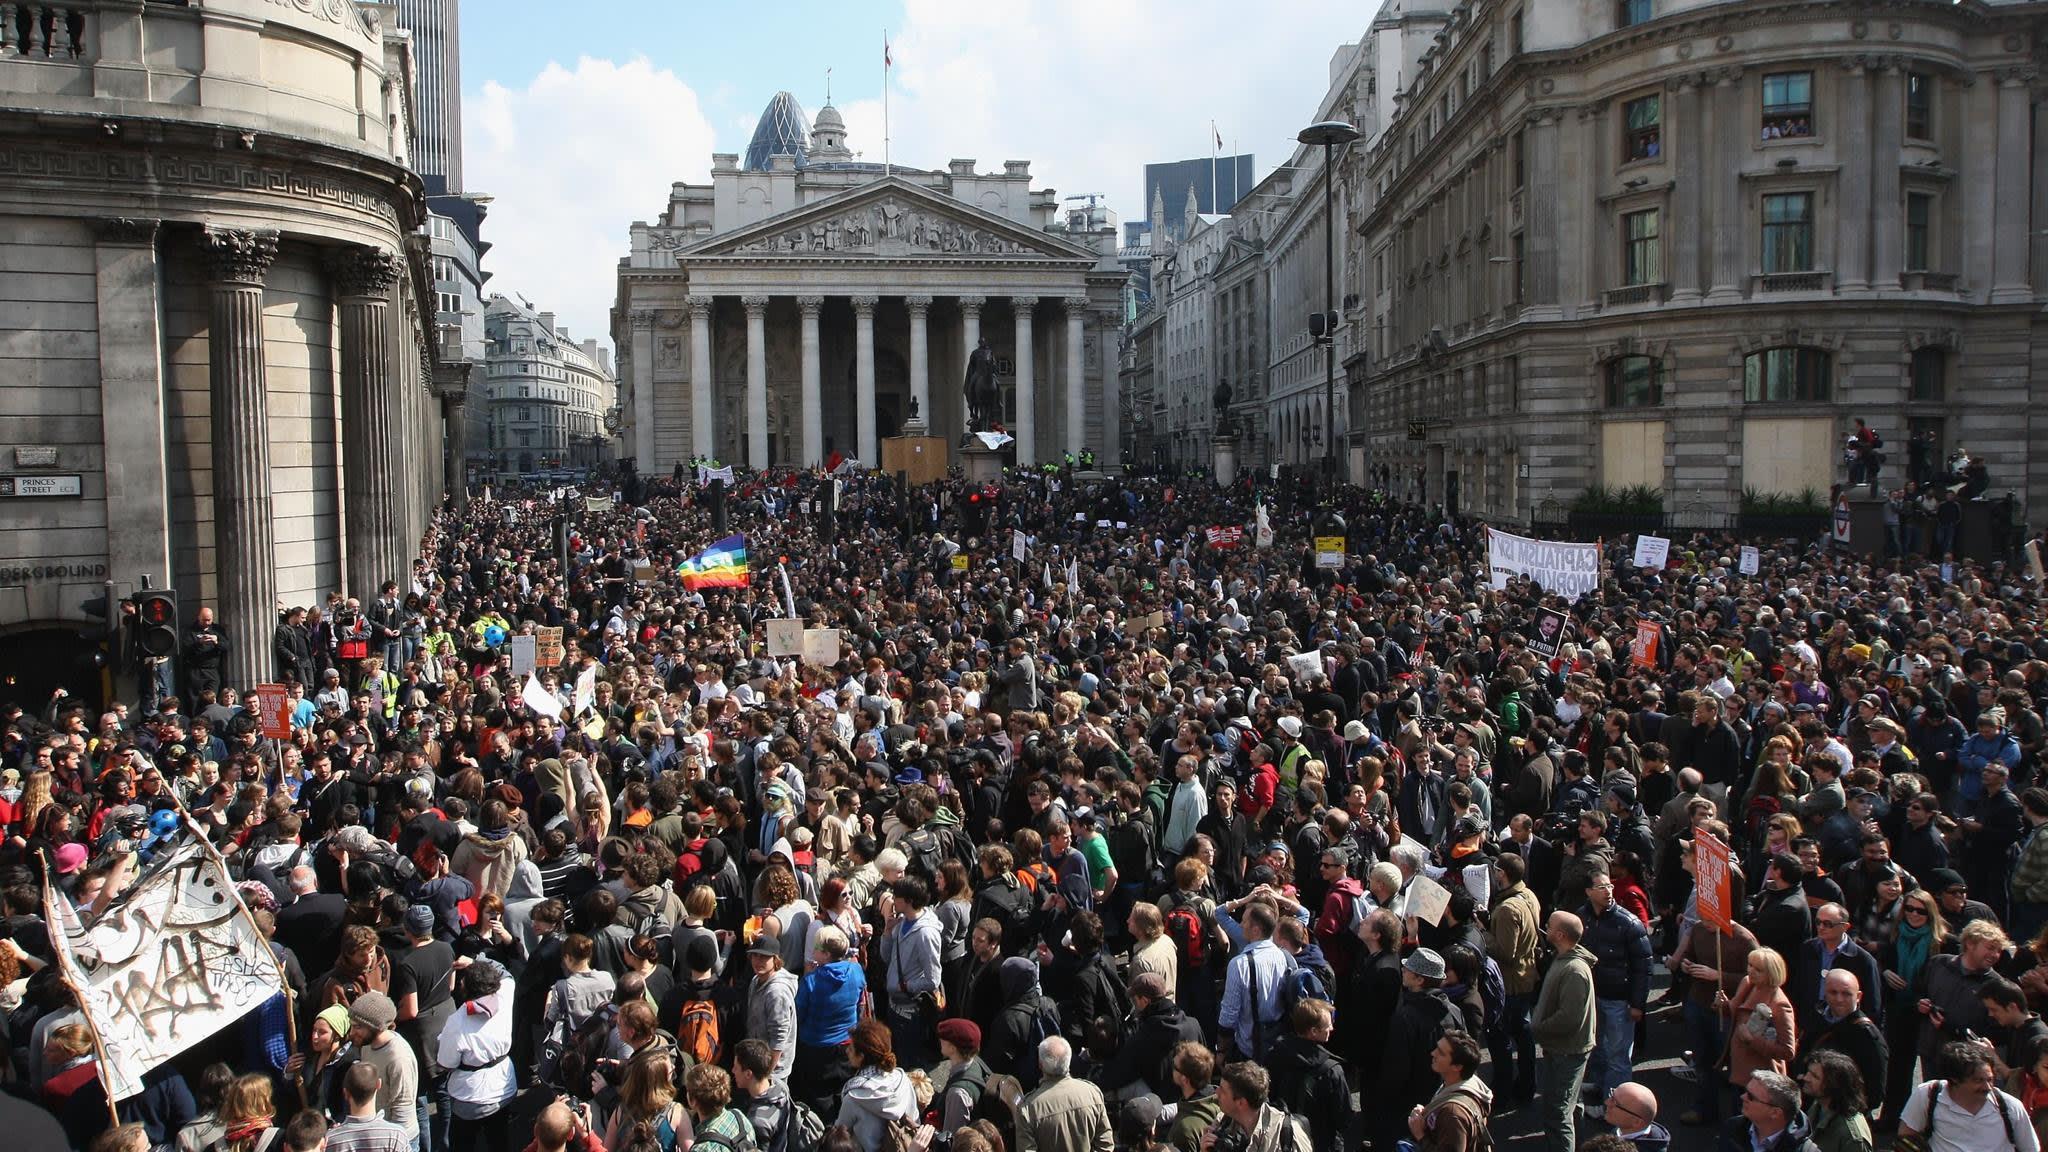 Peer-to-peer lending: The wisdom of crowds | Financial Times